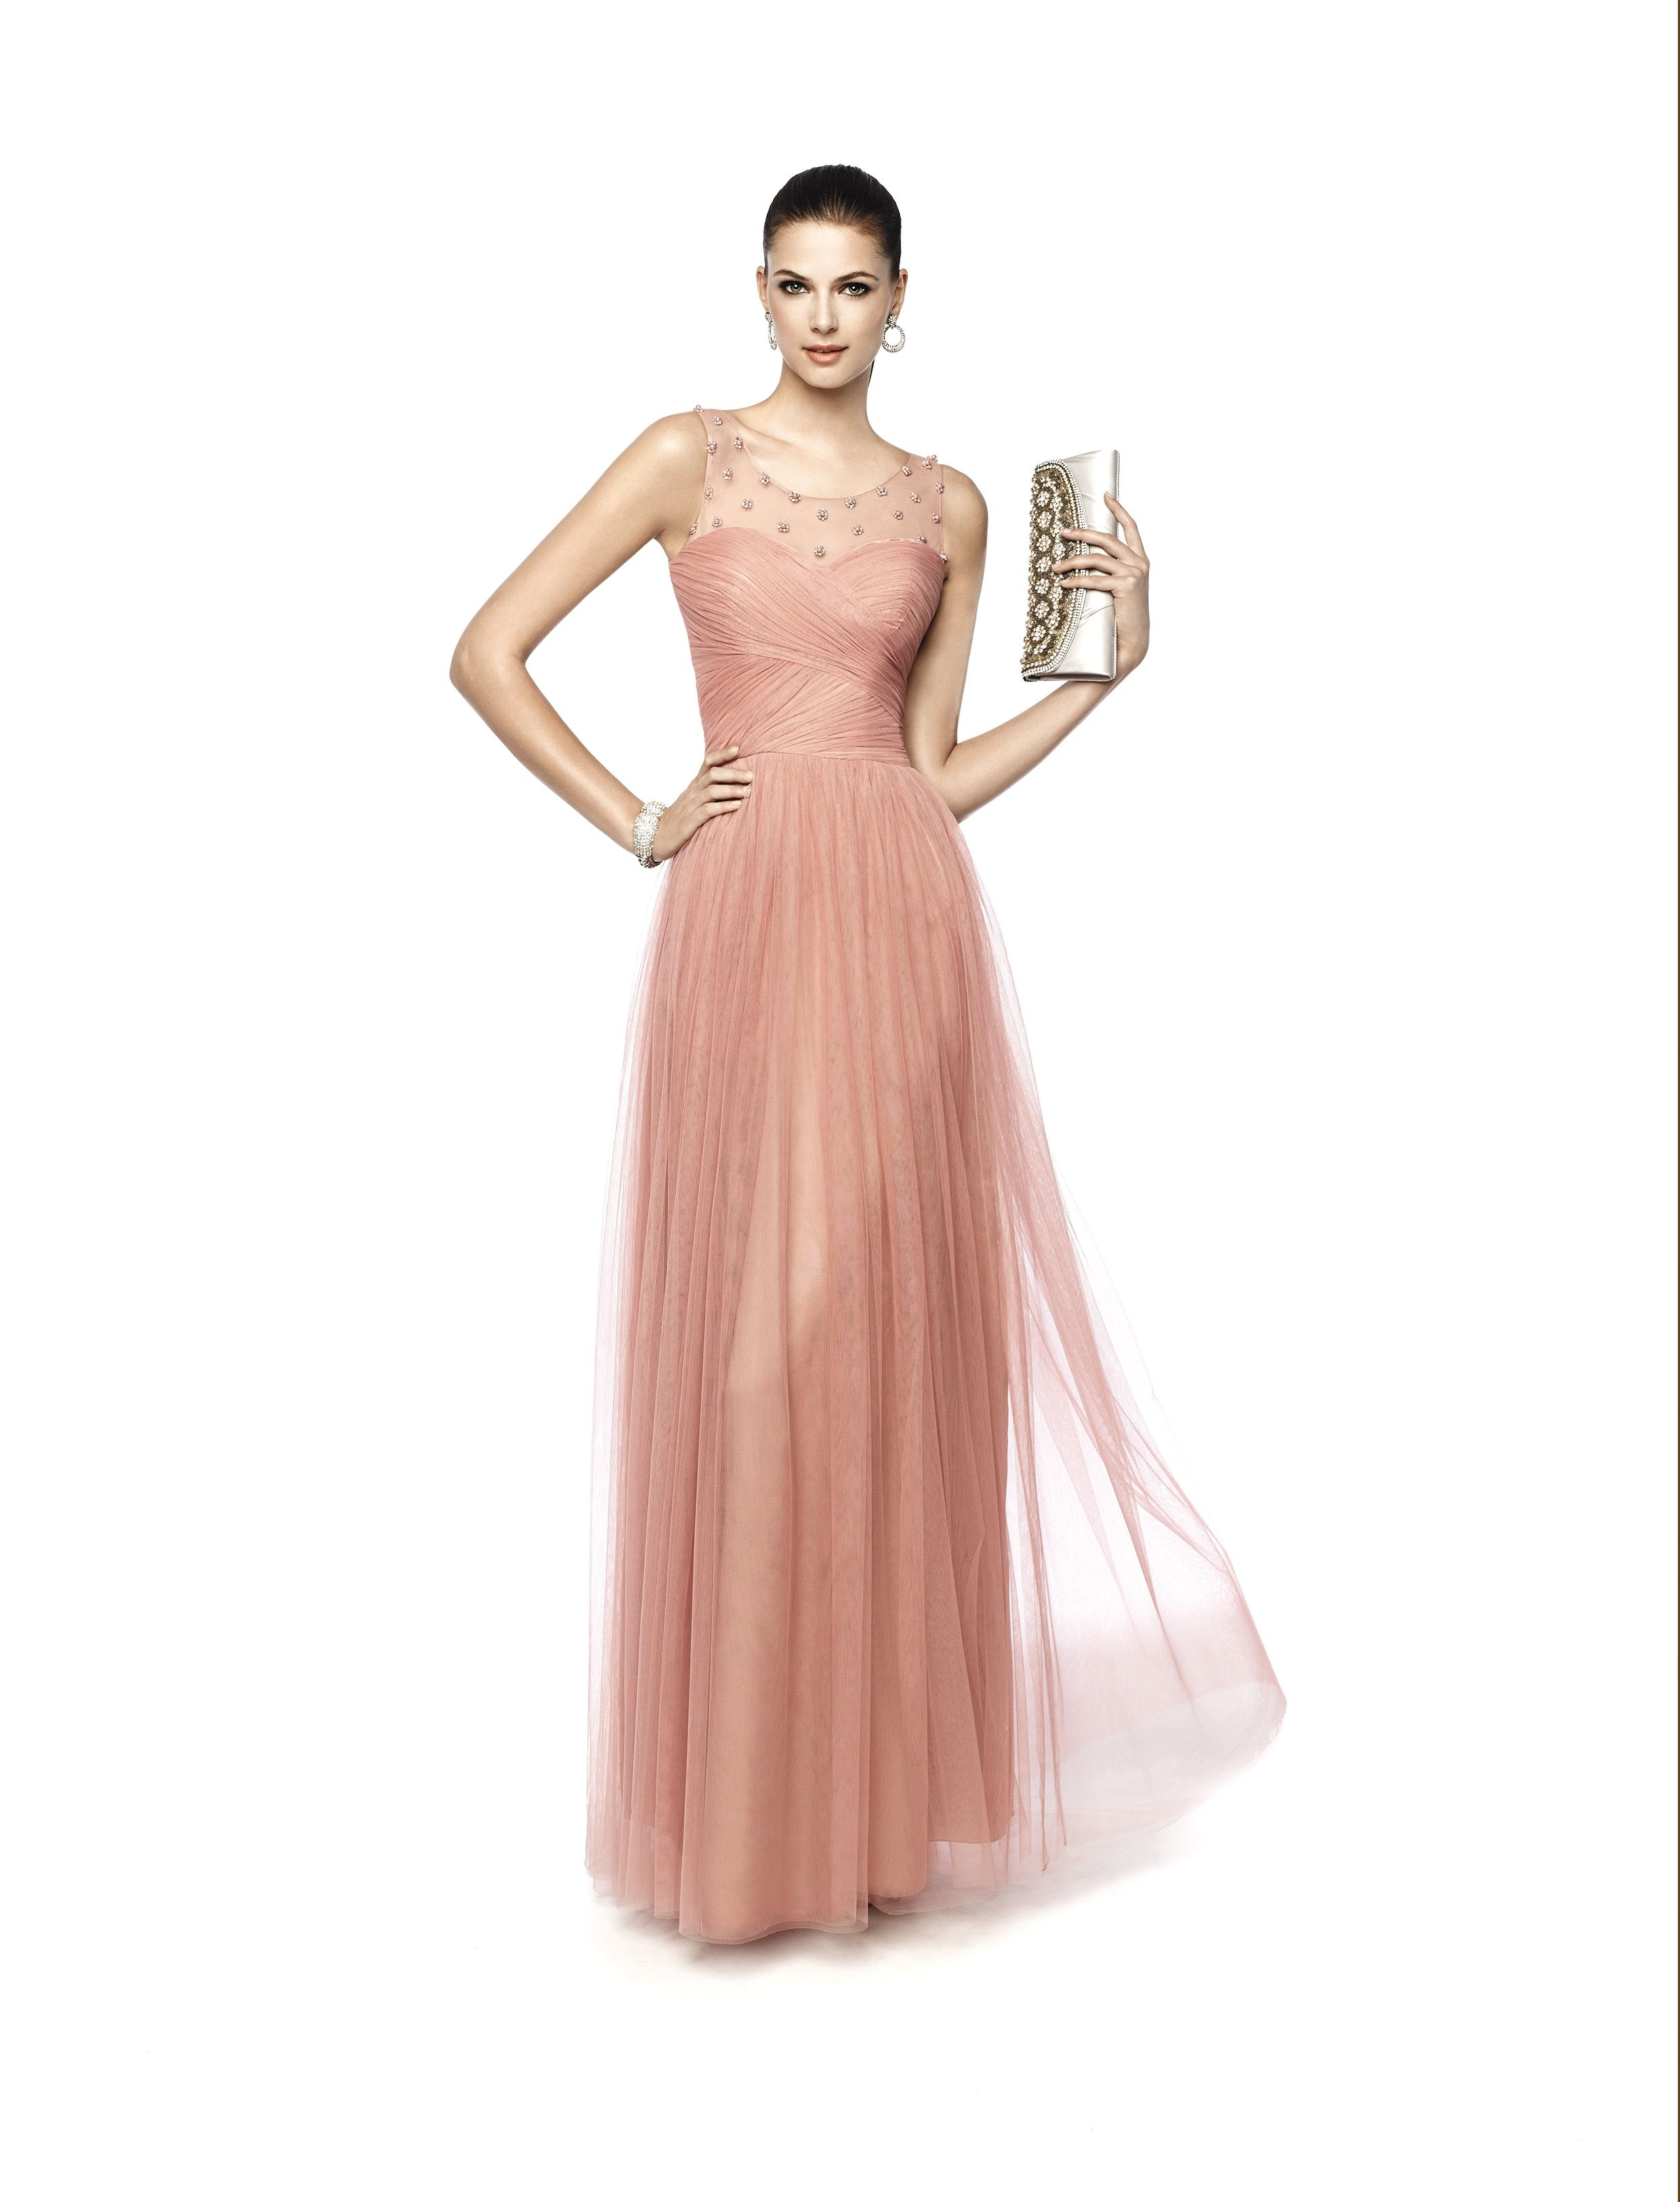 Nevenka vestido de fiesta diseñador pronovias maxi faldas